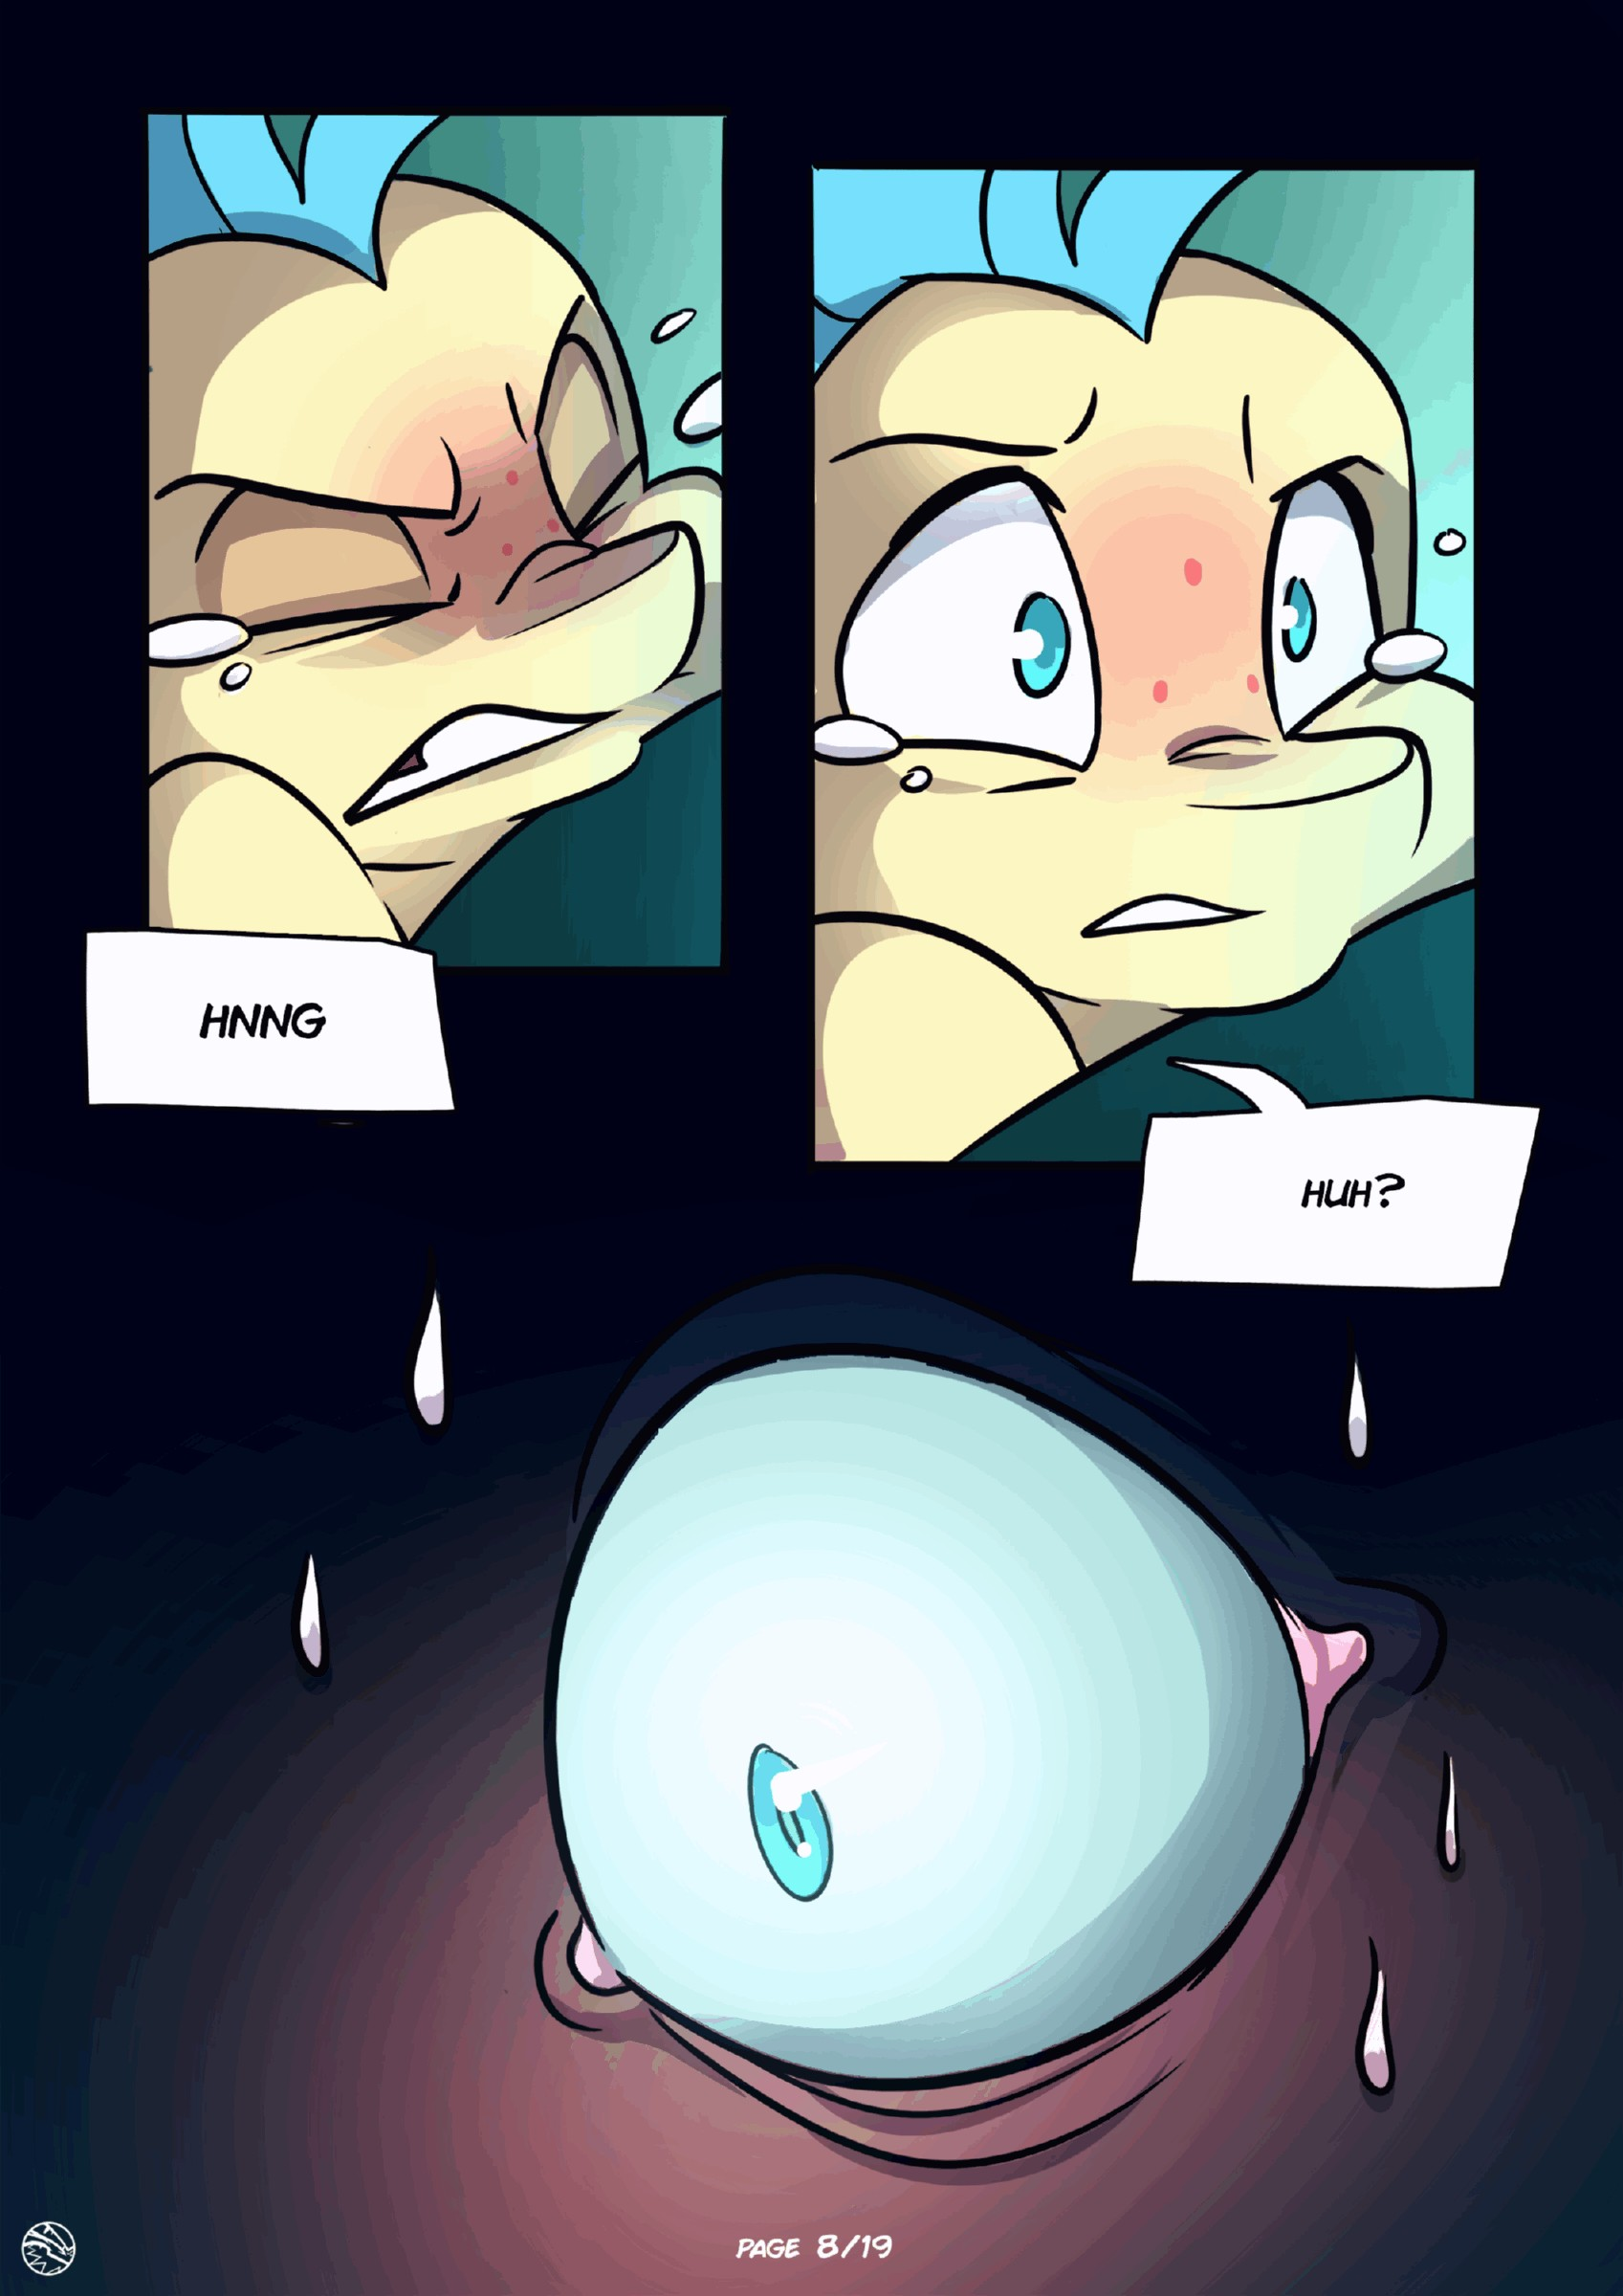 Sea shells porn comic page 008